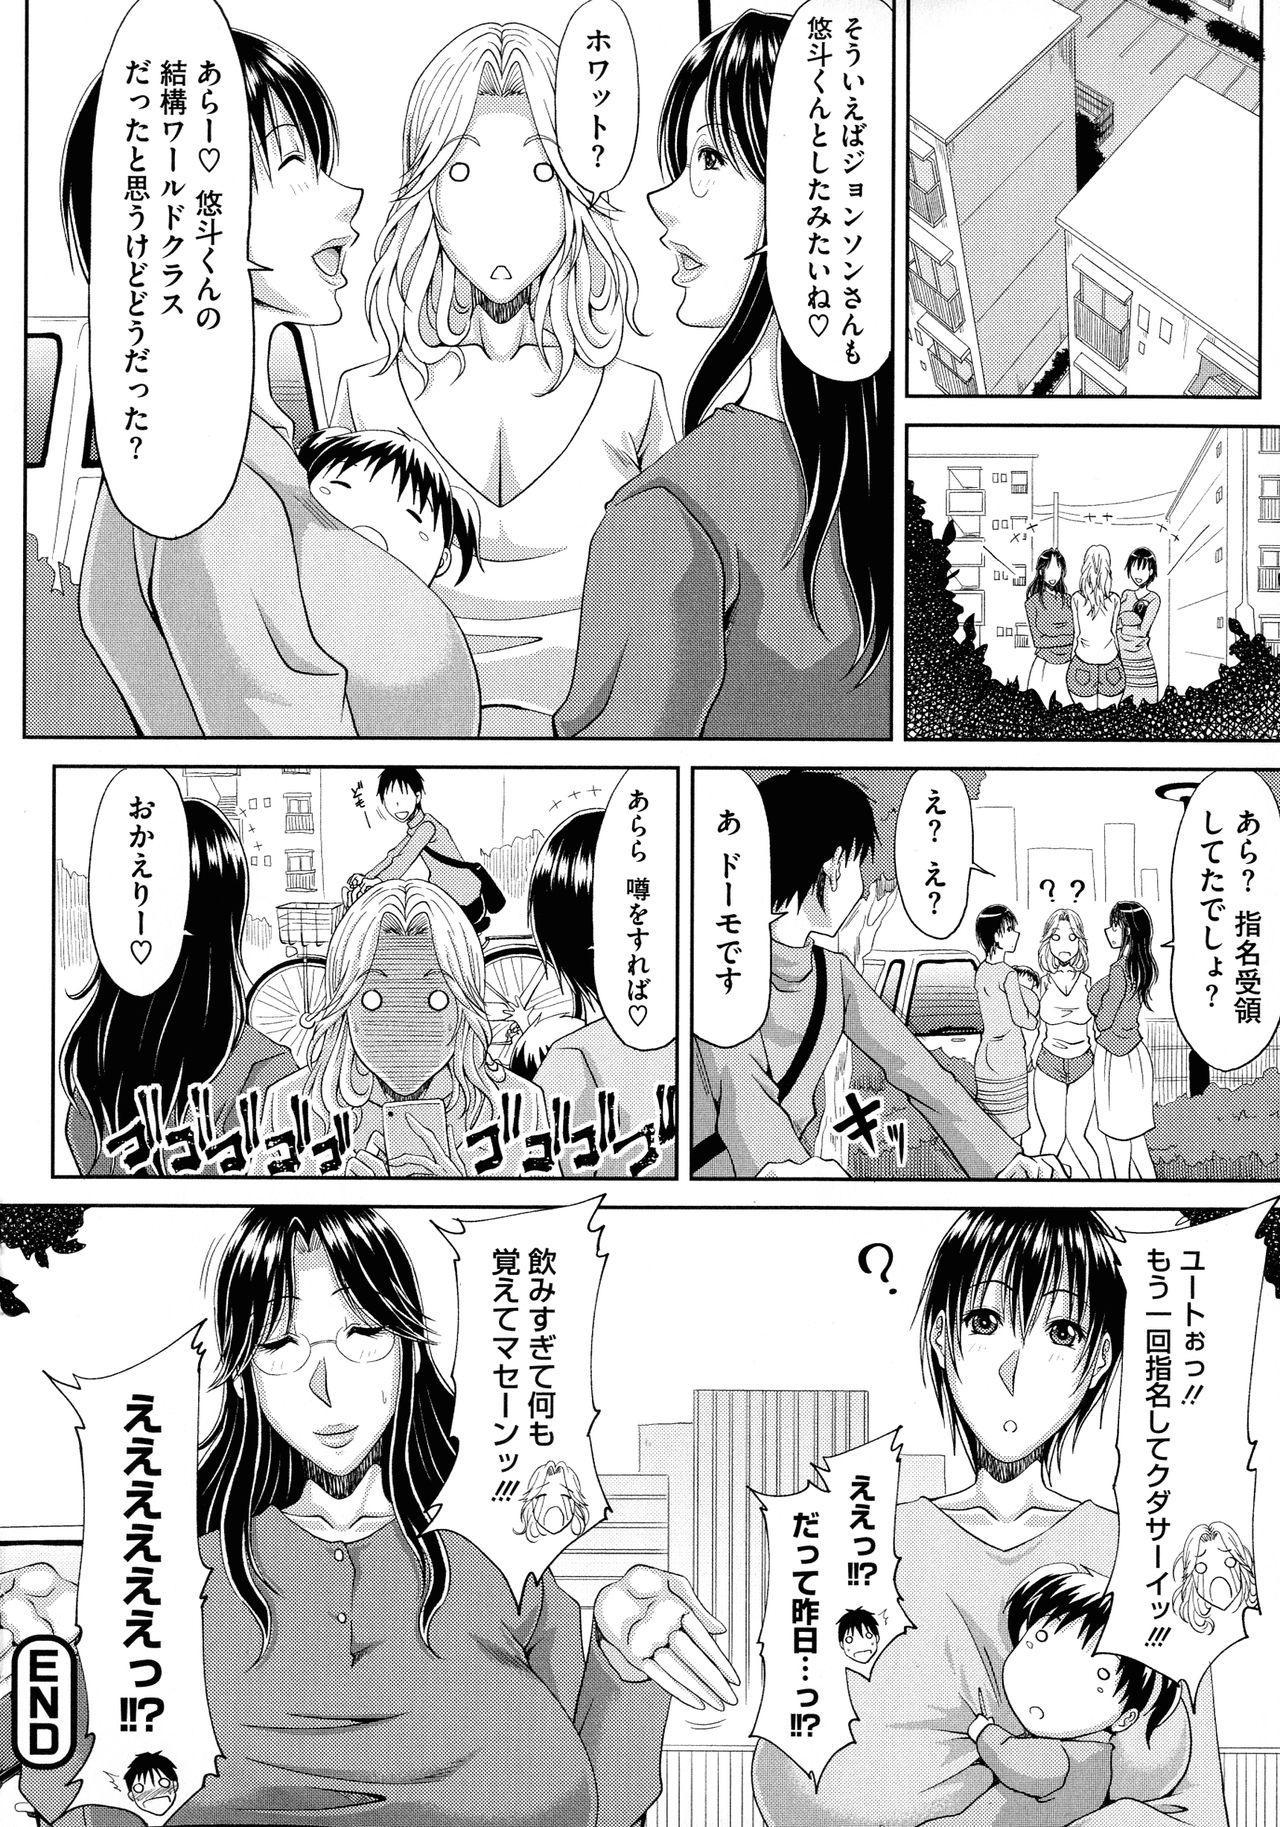 Haramase! 63